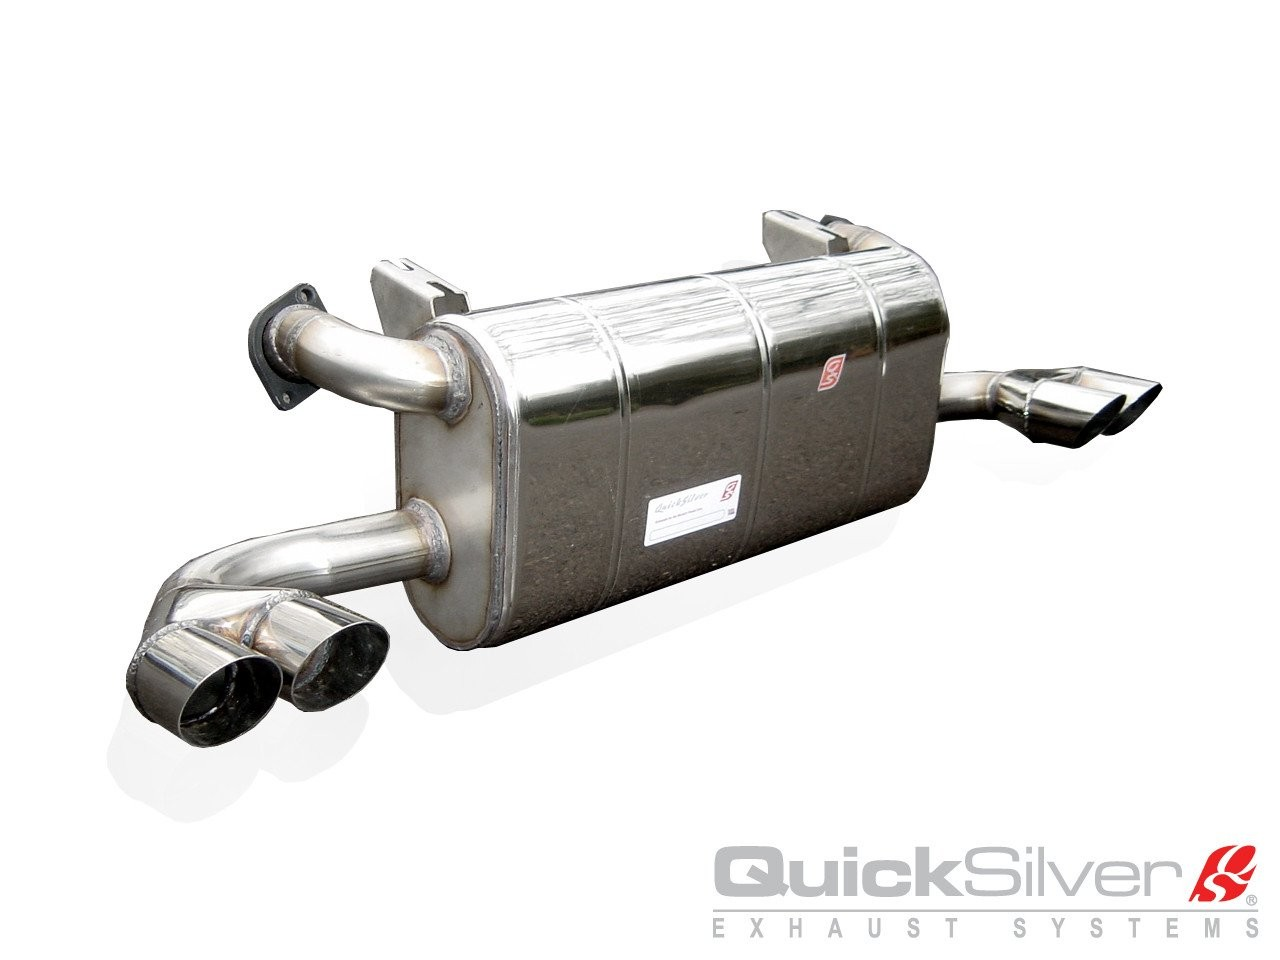 "QuickSilver Exhausts Heritage | Ferrari 348, 1990-94, FE057S (Výfukový systém ""SuperSport"")"